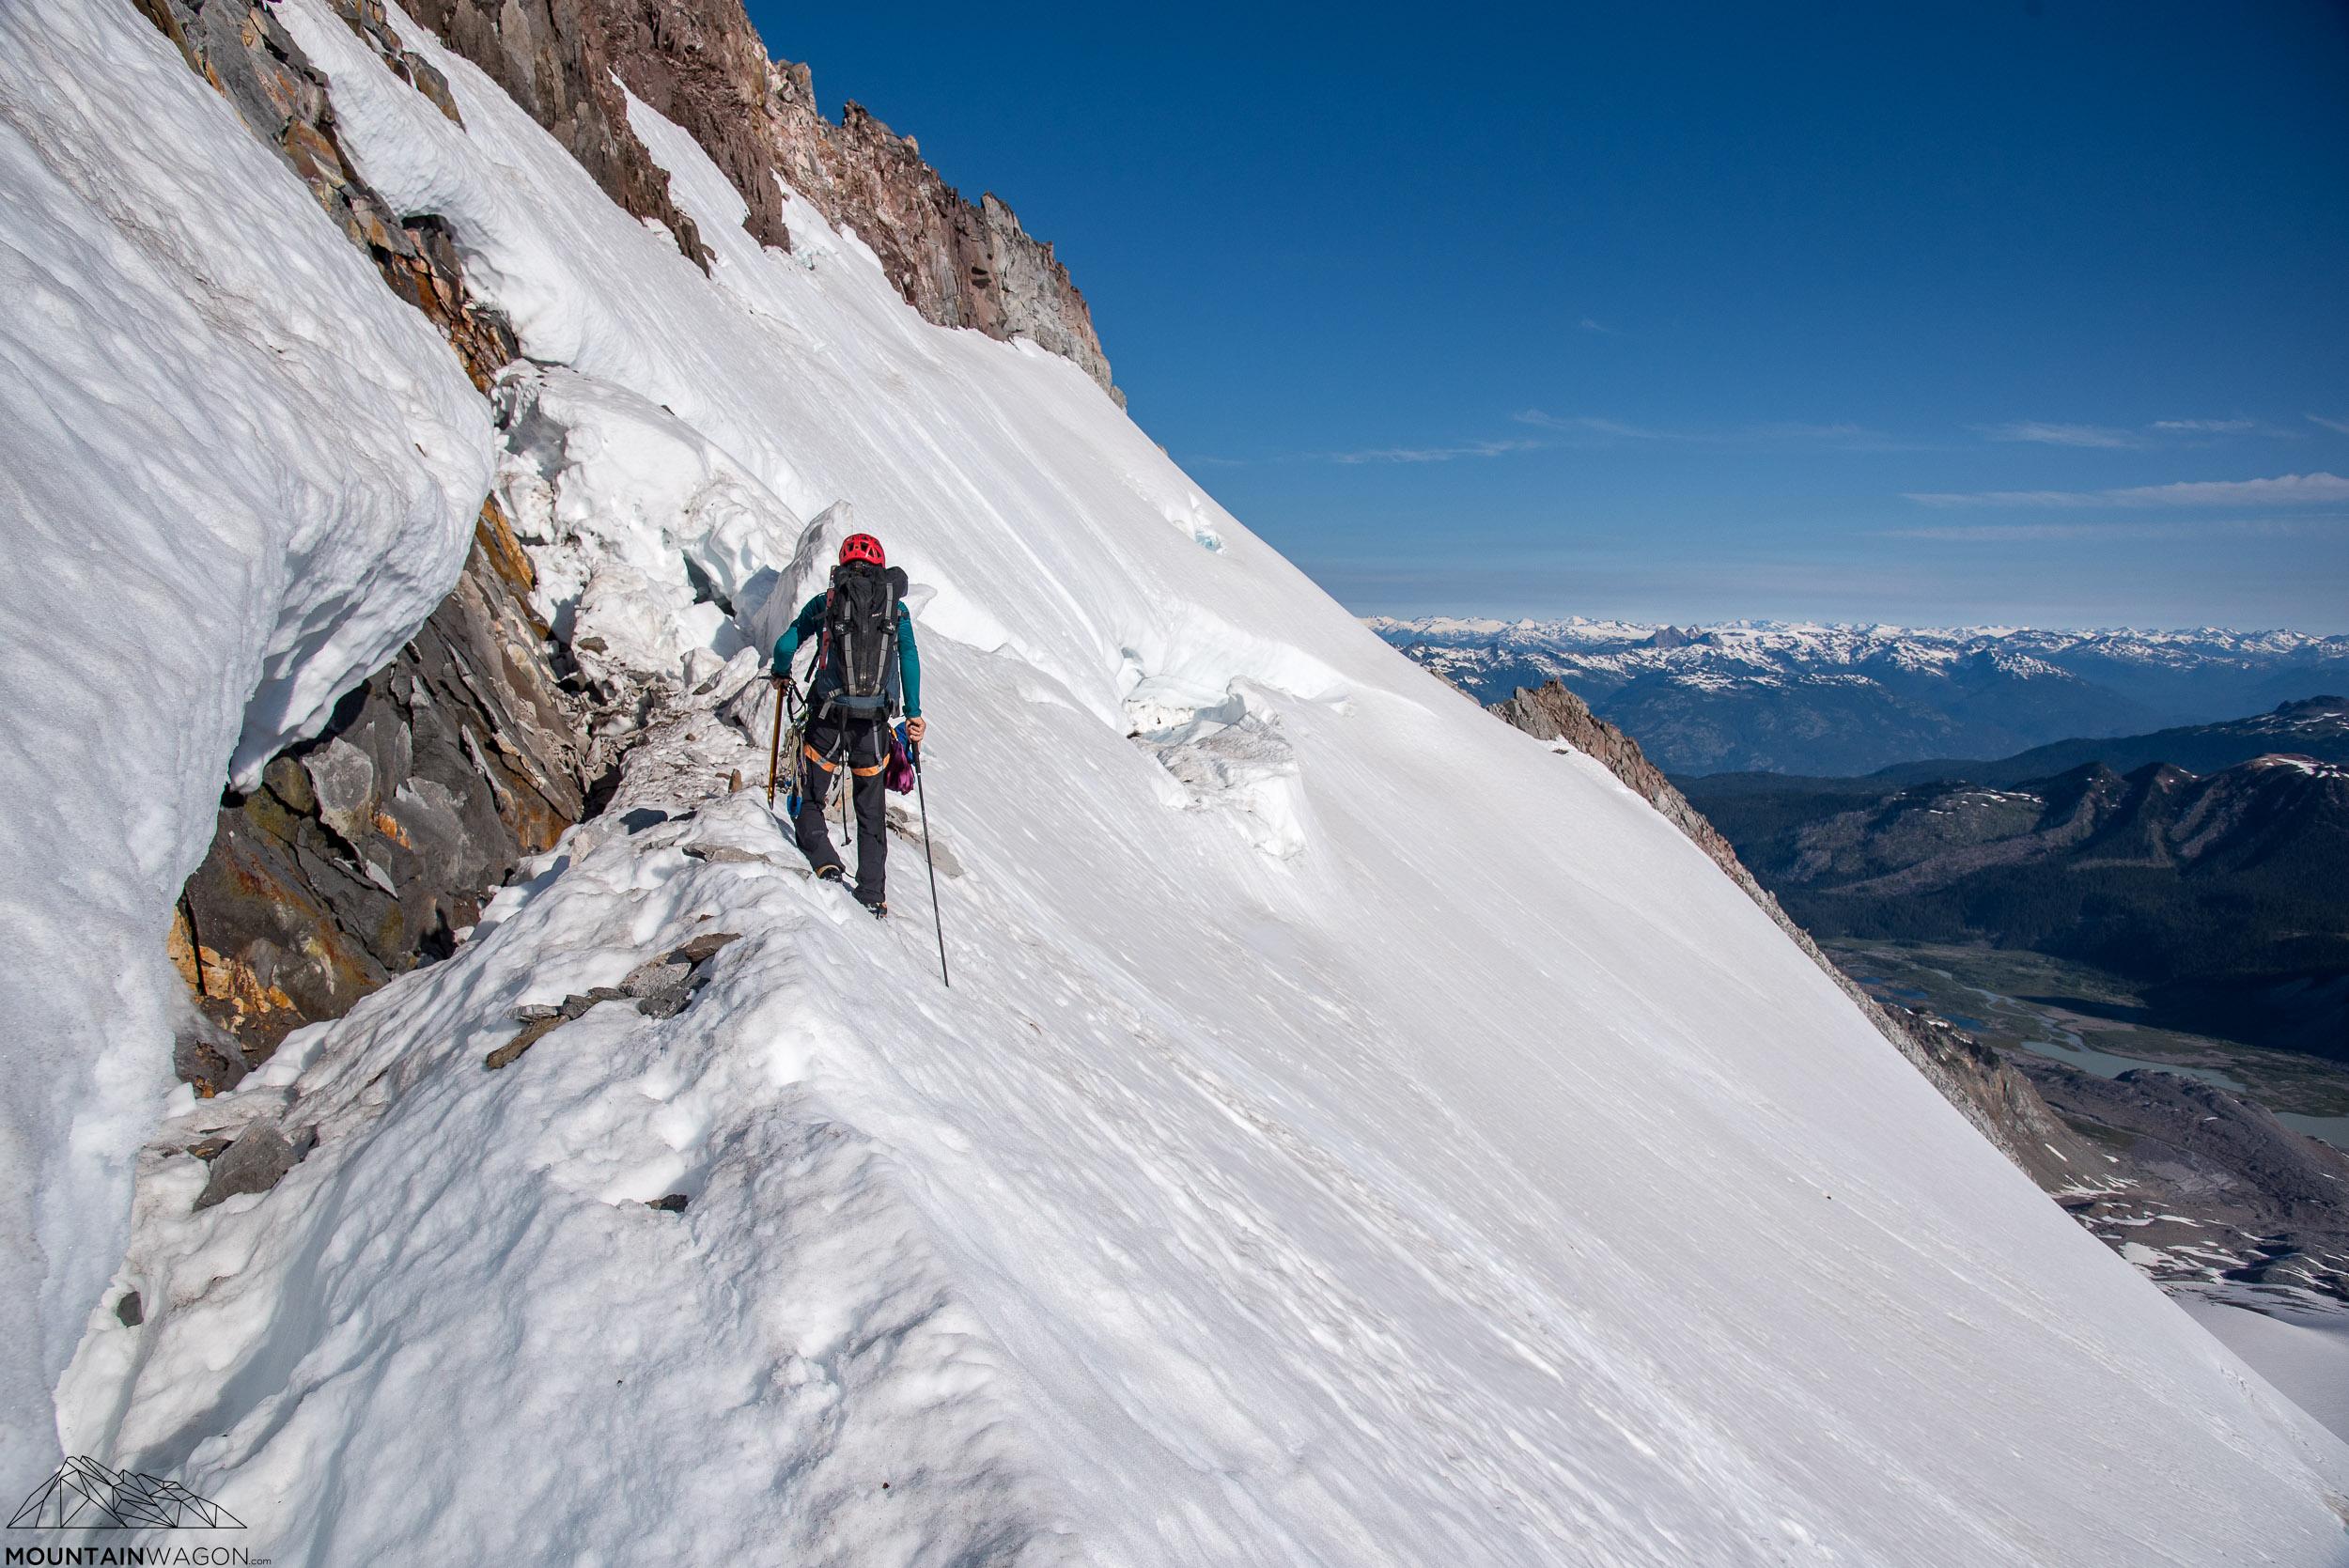 Skirting across the bottom lip of the bergschrund